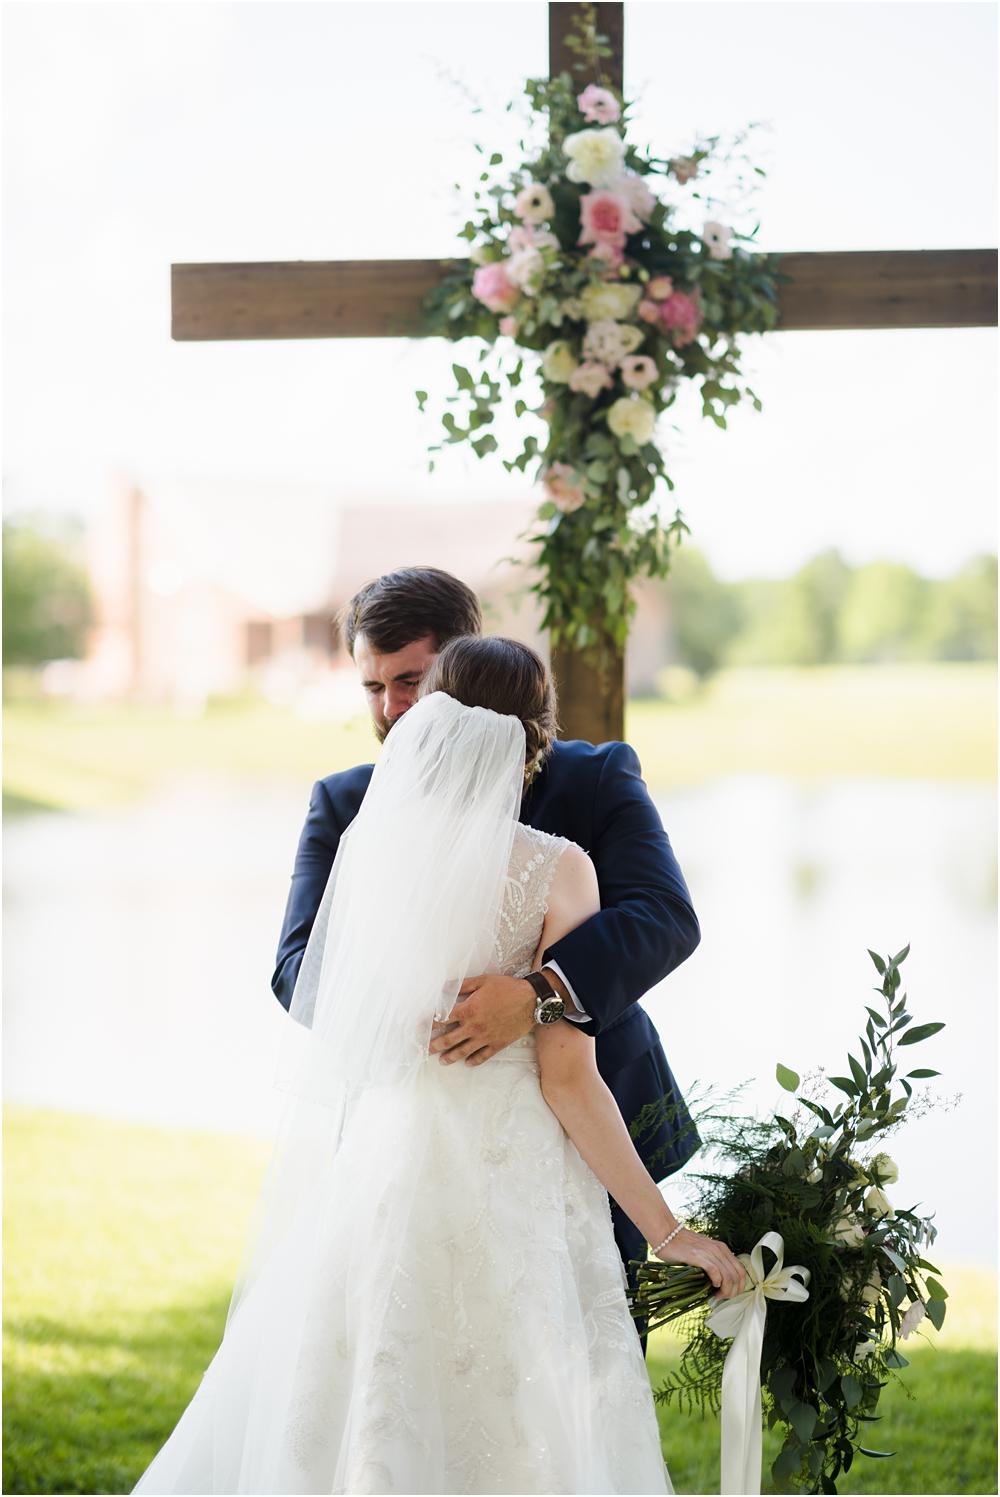 marianna-florida-wedding-photographer-kiersten-grant-50.jpg